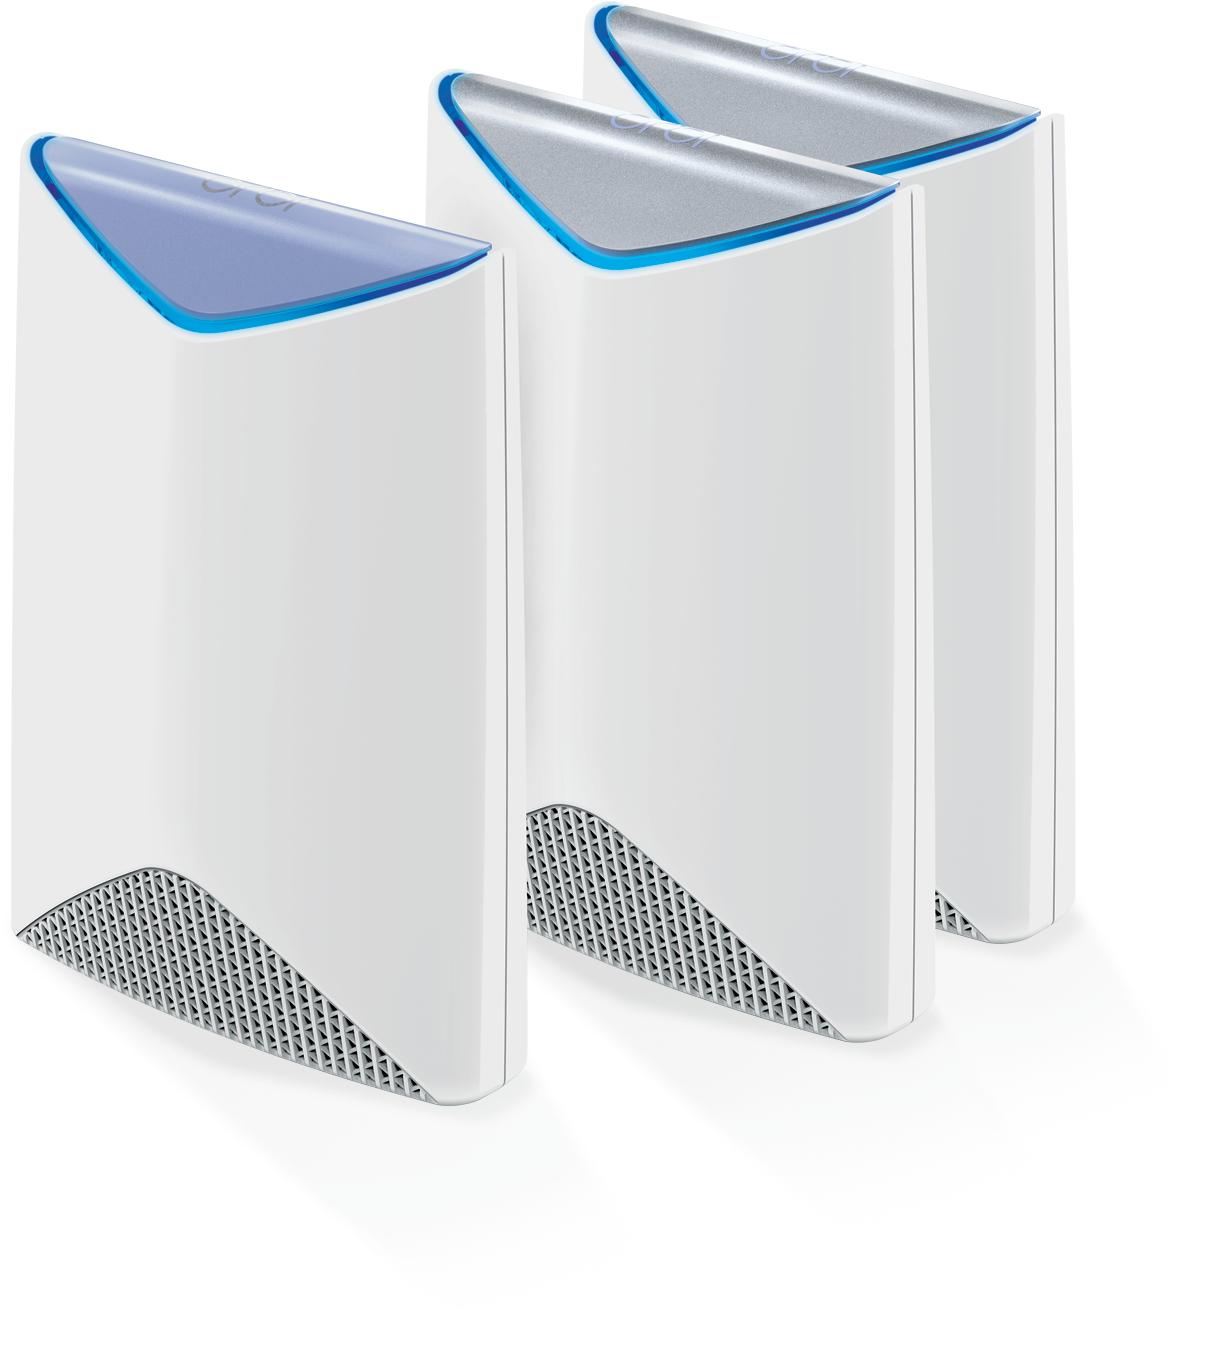 SRK60B03 - Orbi Pro Tri-Band Business Wi-Fi System AC3000